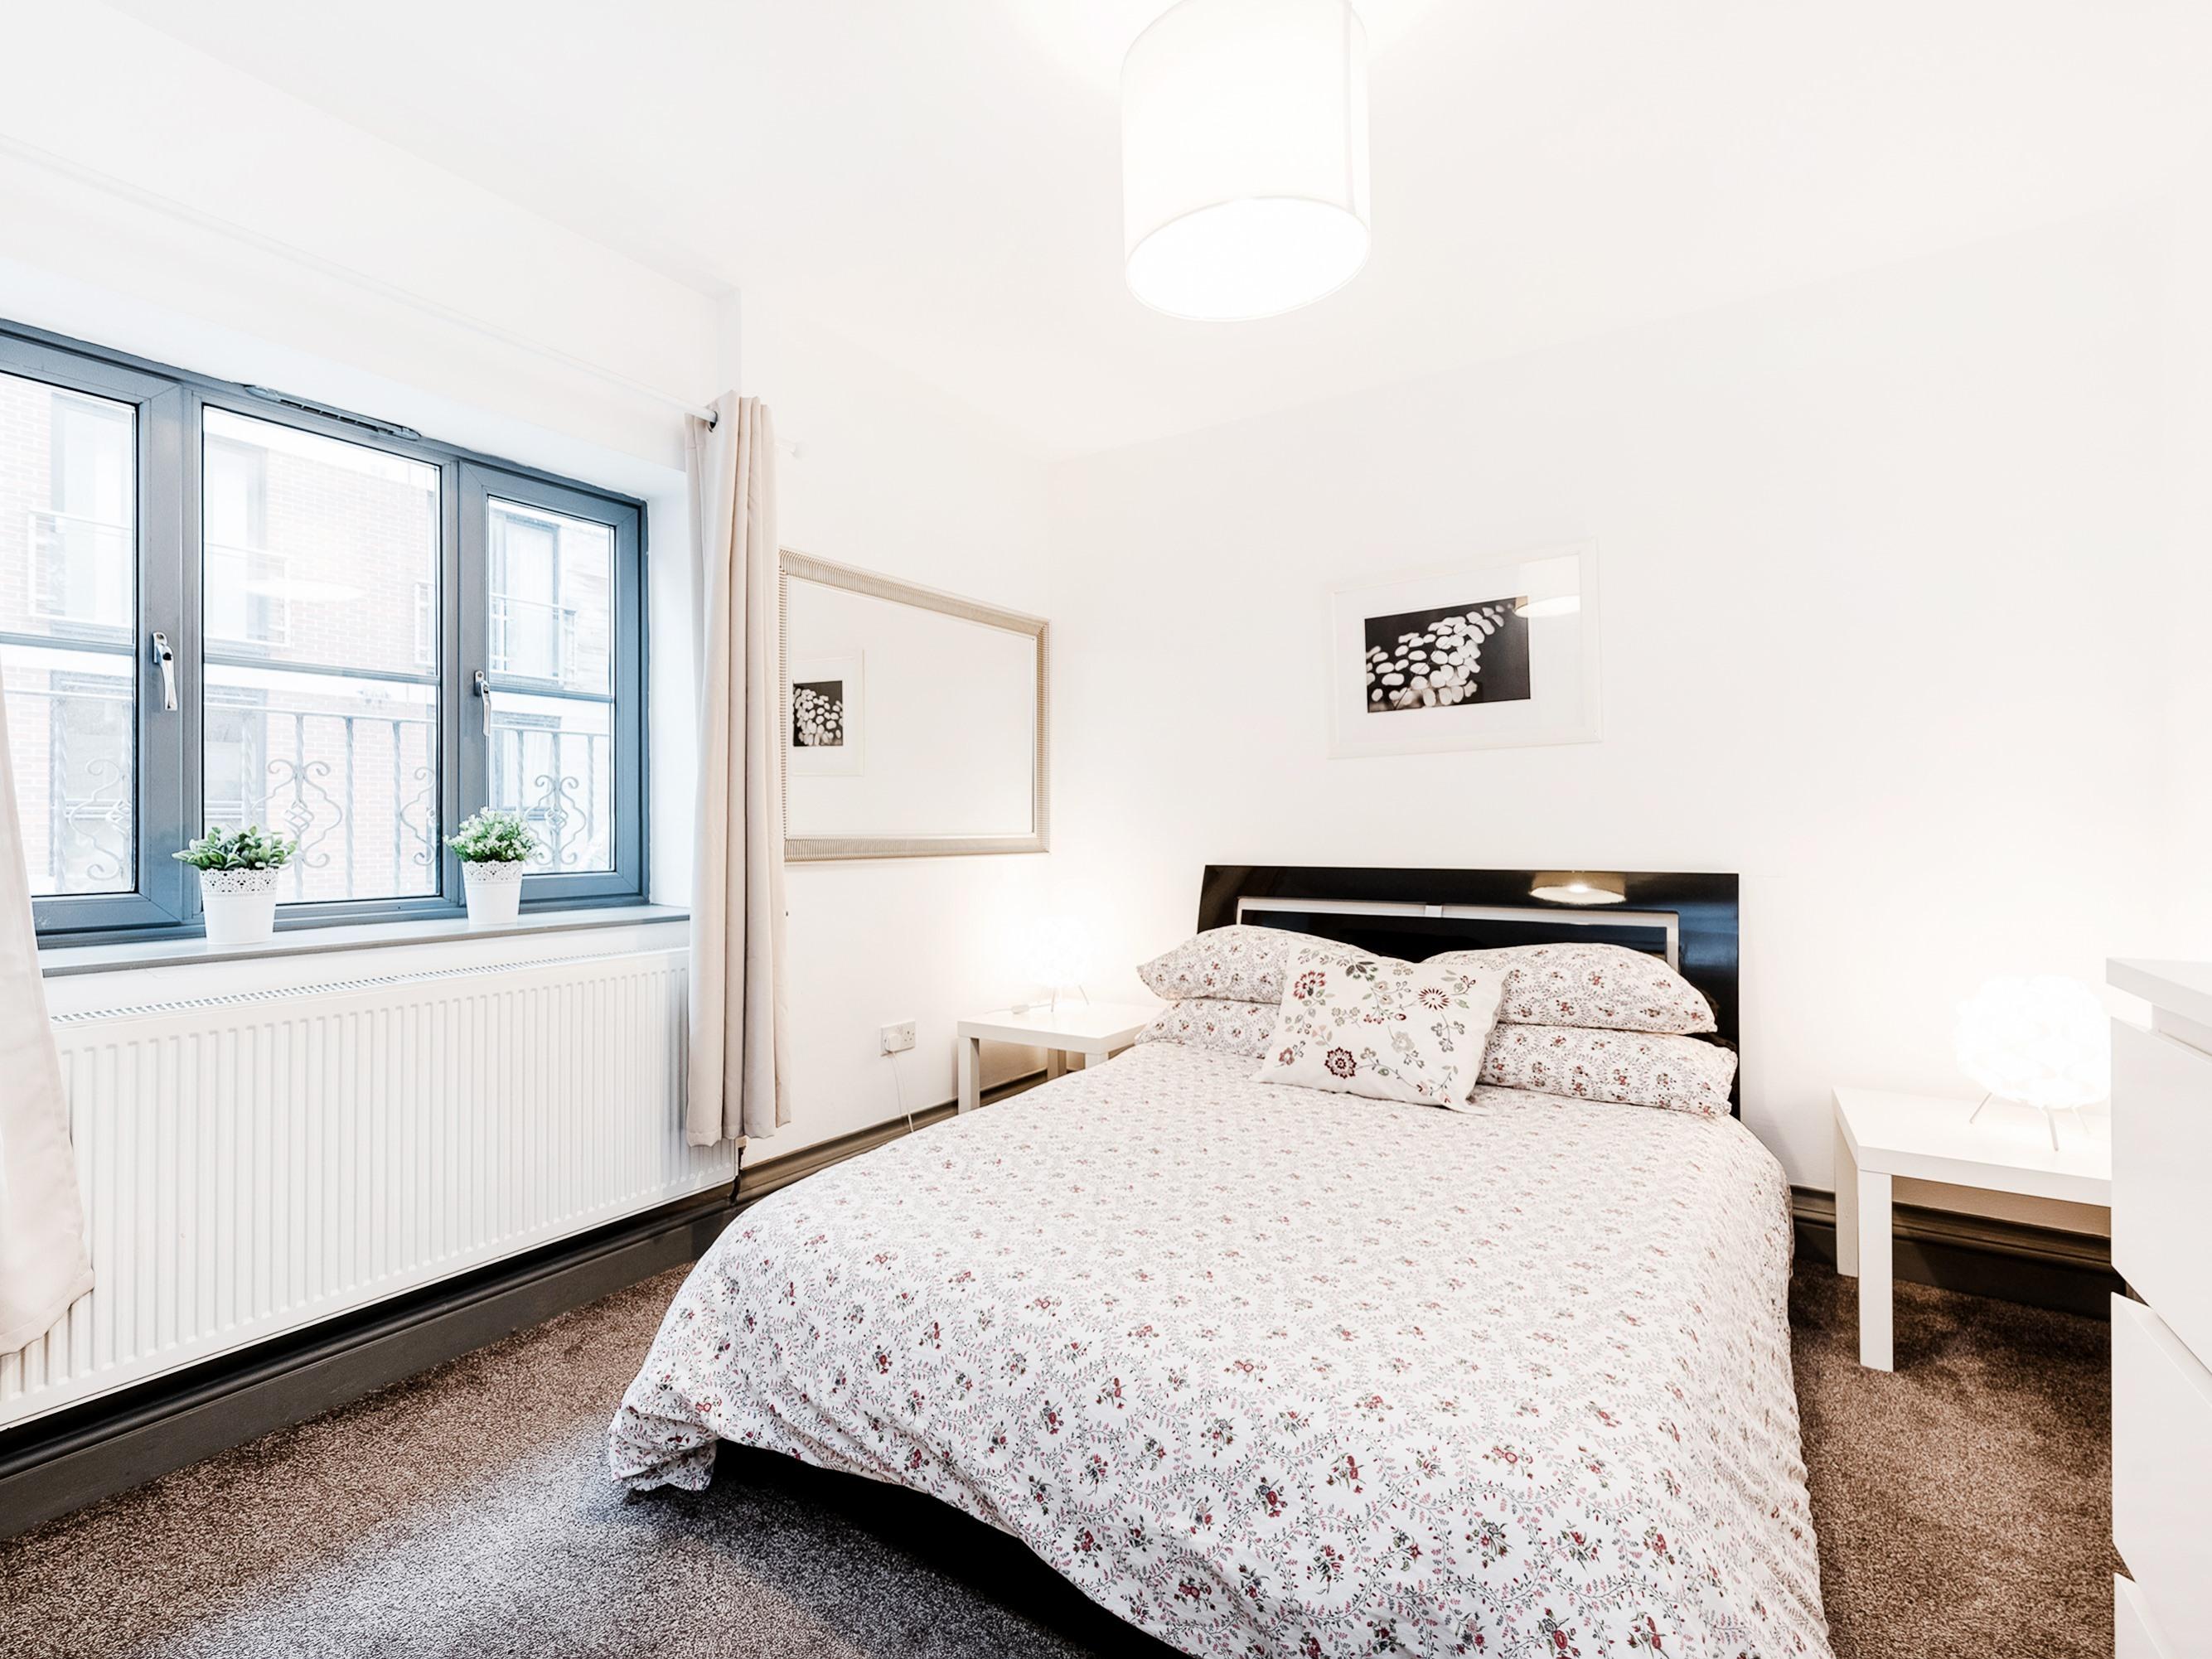 Apartment-Deluxe-Private Bathroom-1 Bedroom